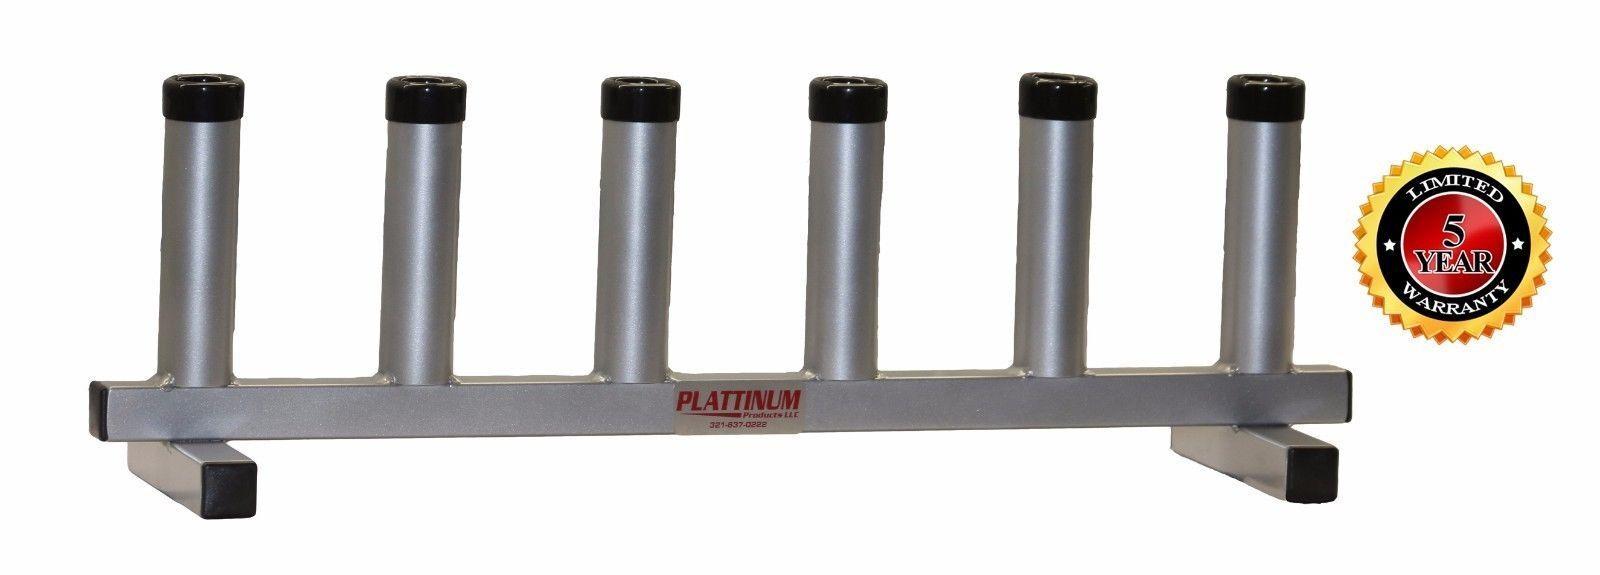 Plattinum,  Fishing Rod Holder Fishing Pole Holder All Aluminum Floor Stand  best reputation